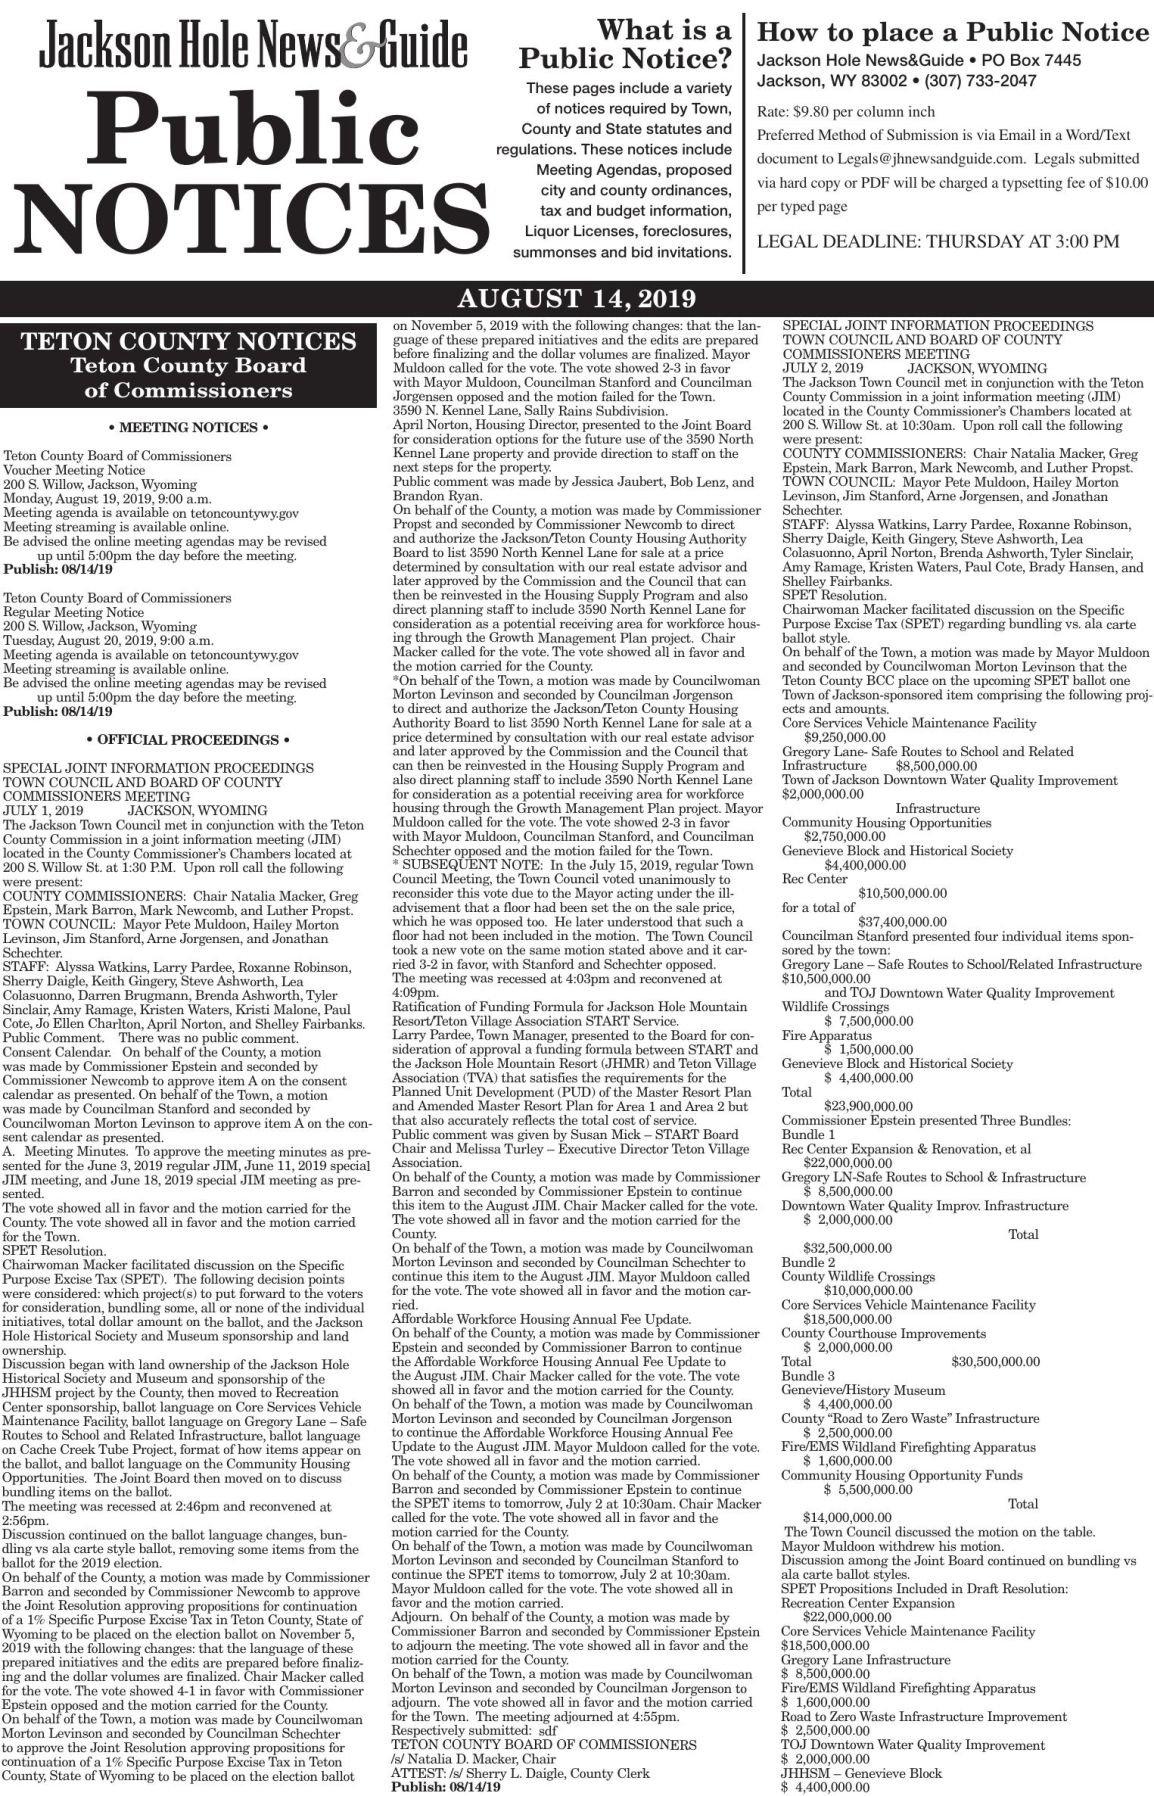 Public Notices, August 14, 2019